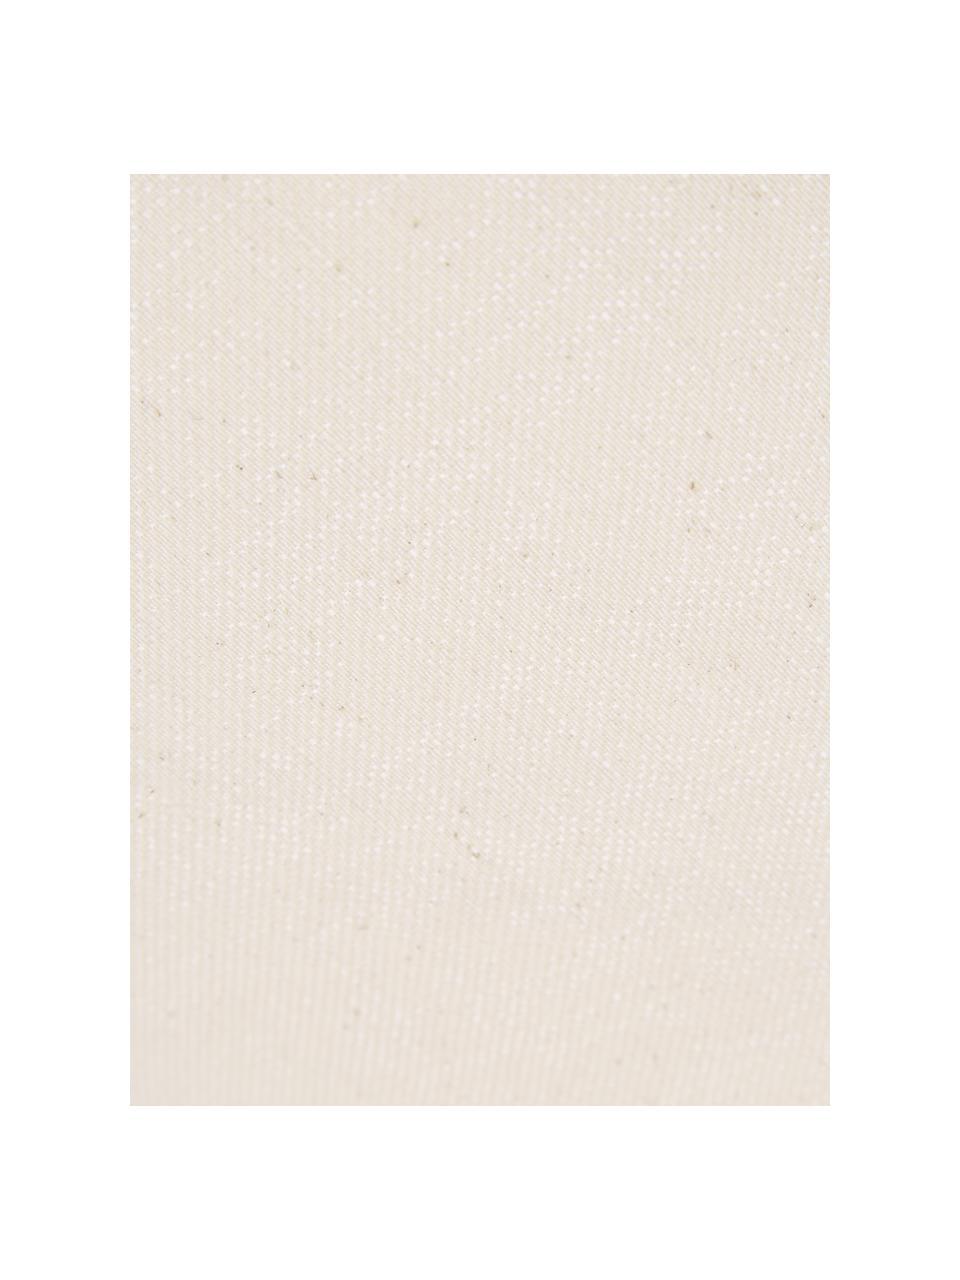 Federa arredo con frange Tine, Beige chiaro, Larg. 30 x Lung. 50 cm